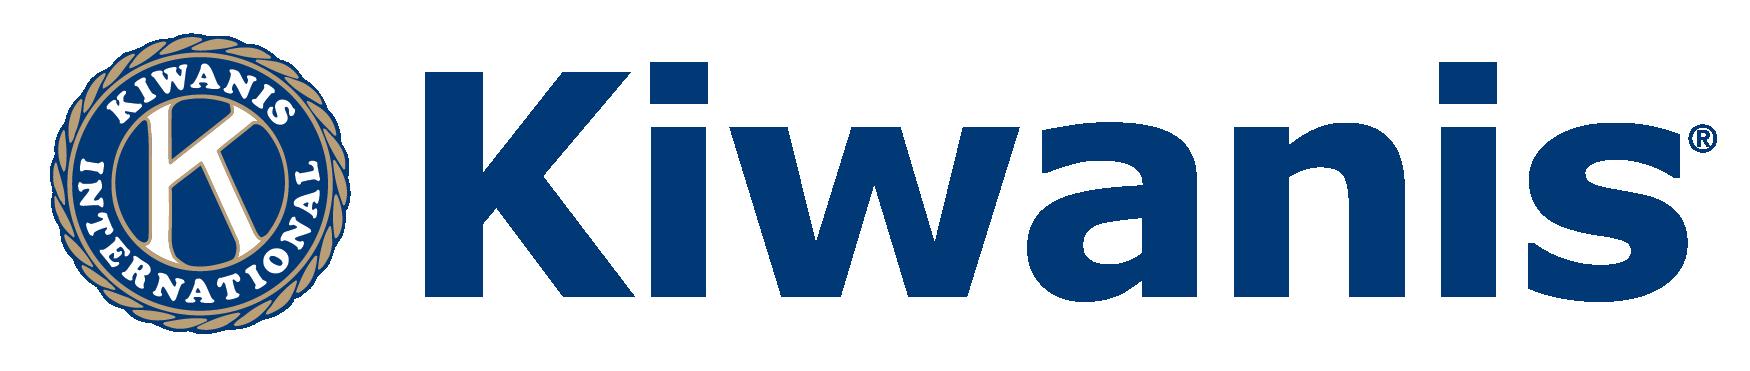 Kiwanis Club International Logo